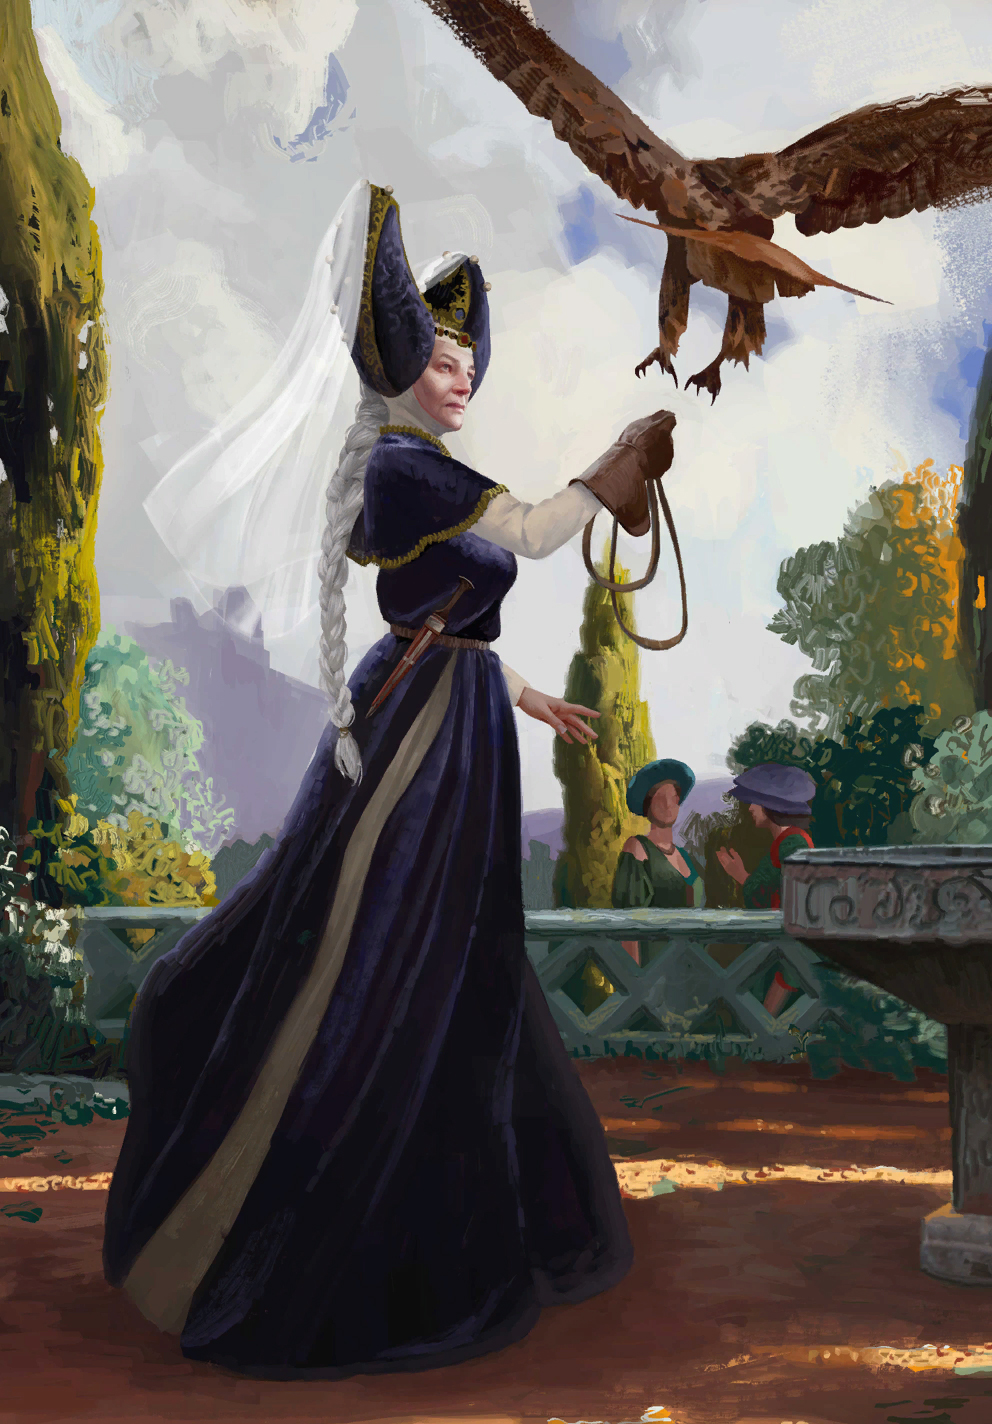 Gwent cardart northern queen calanthe